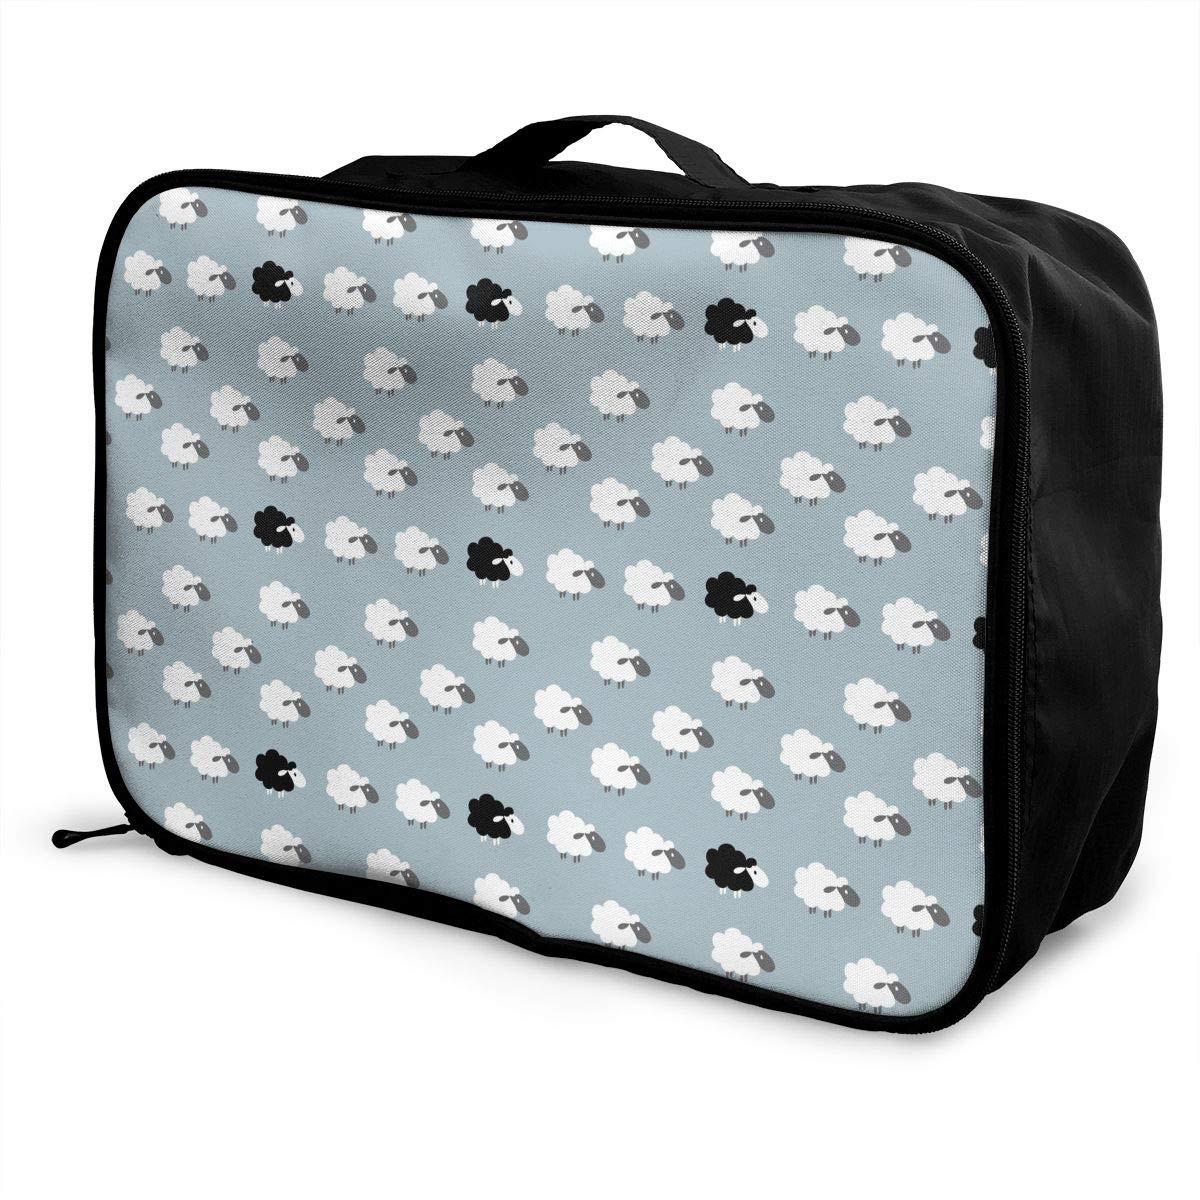 Travel Luggage Duffle Bag Lightweight Portable Handbag White Black Sheep Pattern Large Capacity Waterproof Foldable Storage Tote